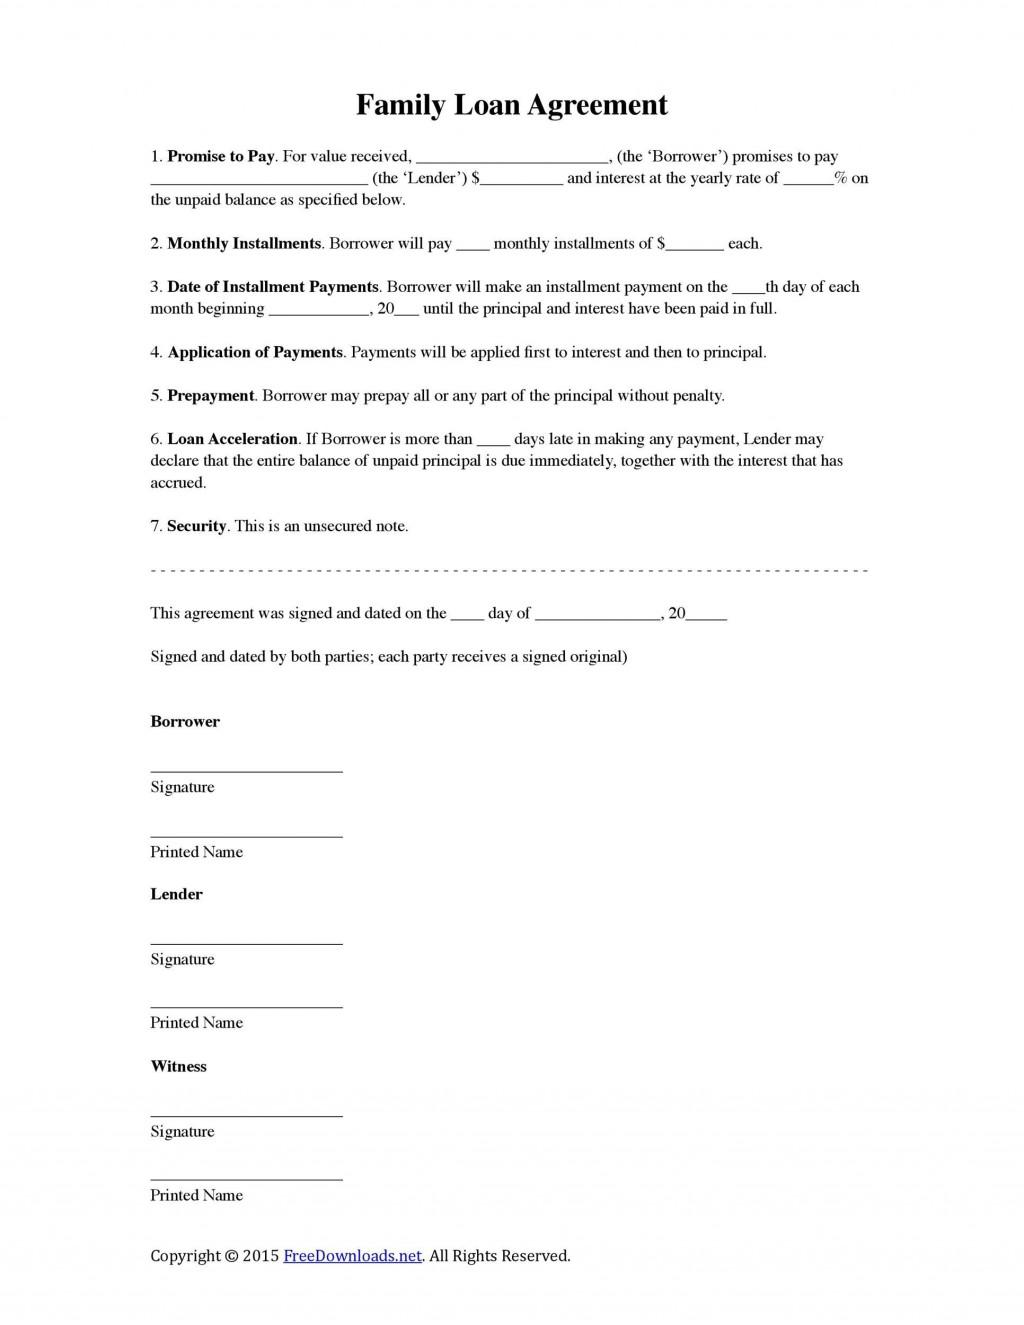 008 Impressive Family Loan Agreement Template Pdf Uk Image Large